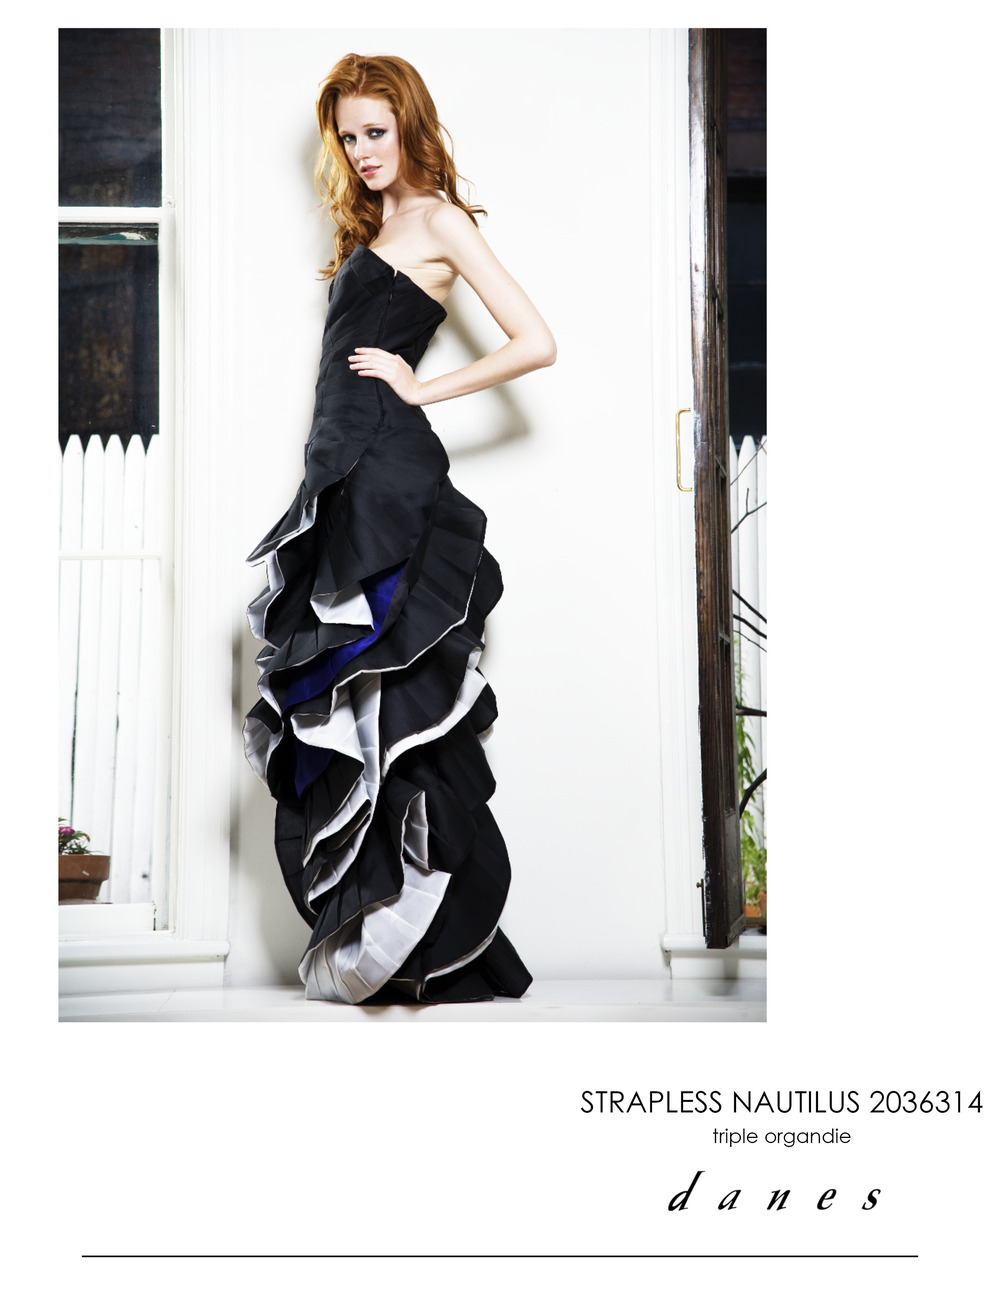 Strapless Nautilus Ind to JPG.jpg